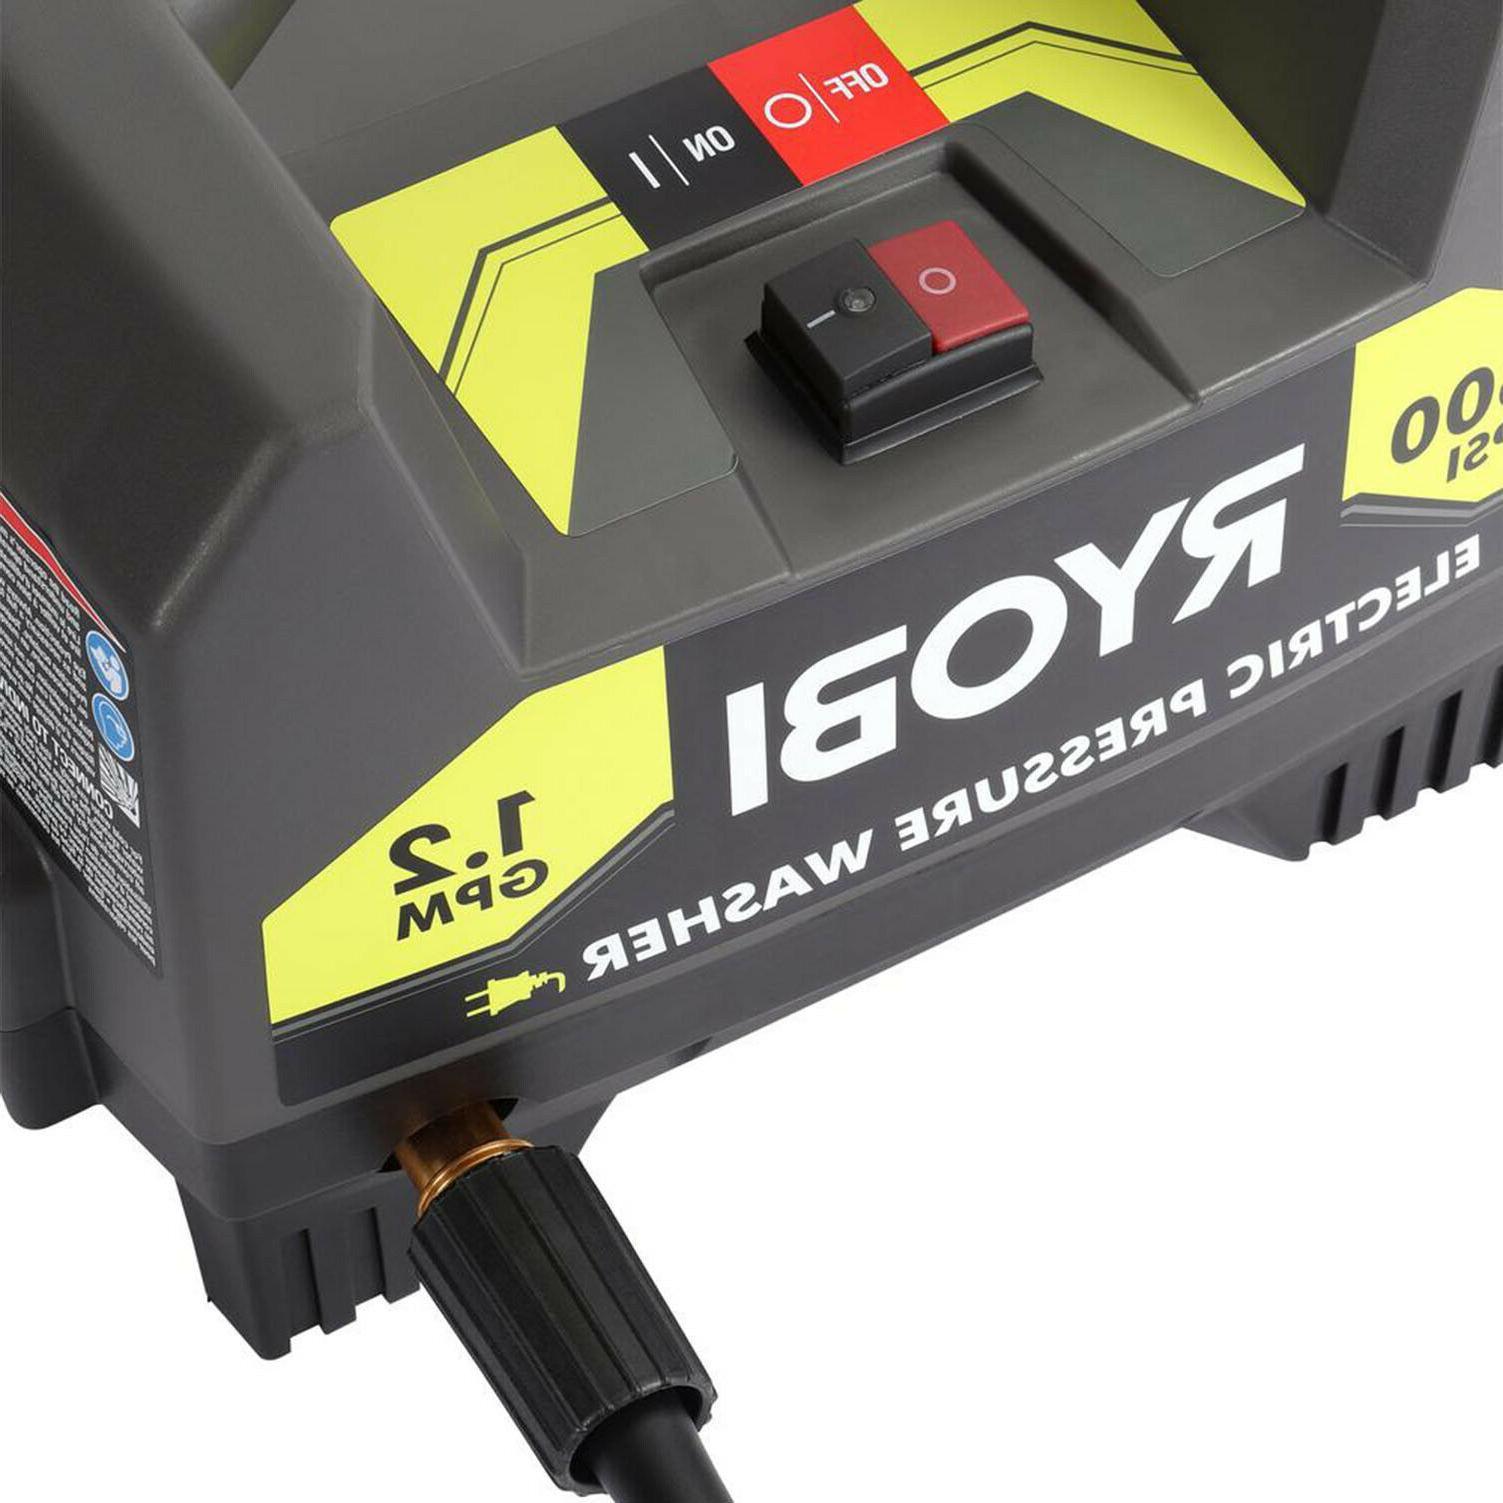 1600 PSI ELECTRIC WASHER RYOBI 1.2 Power Washer Nozzle